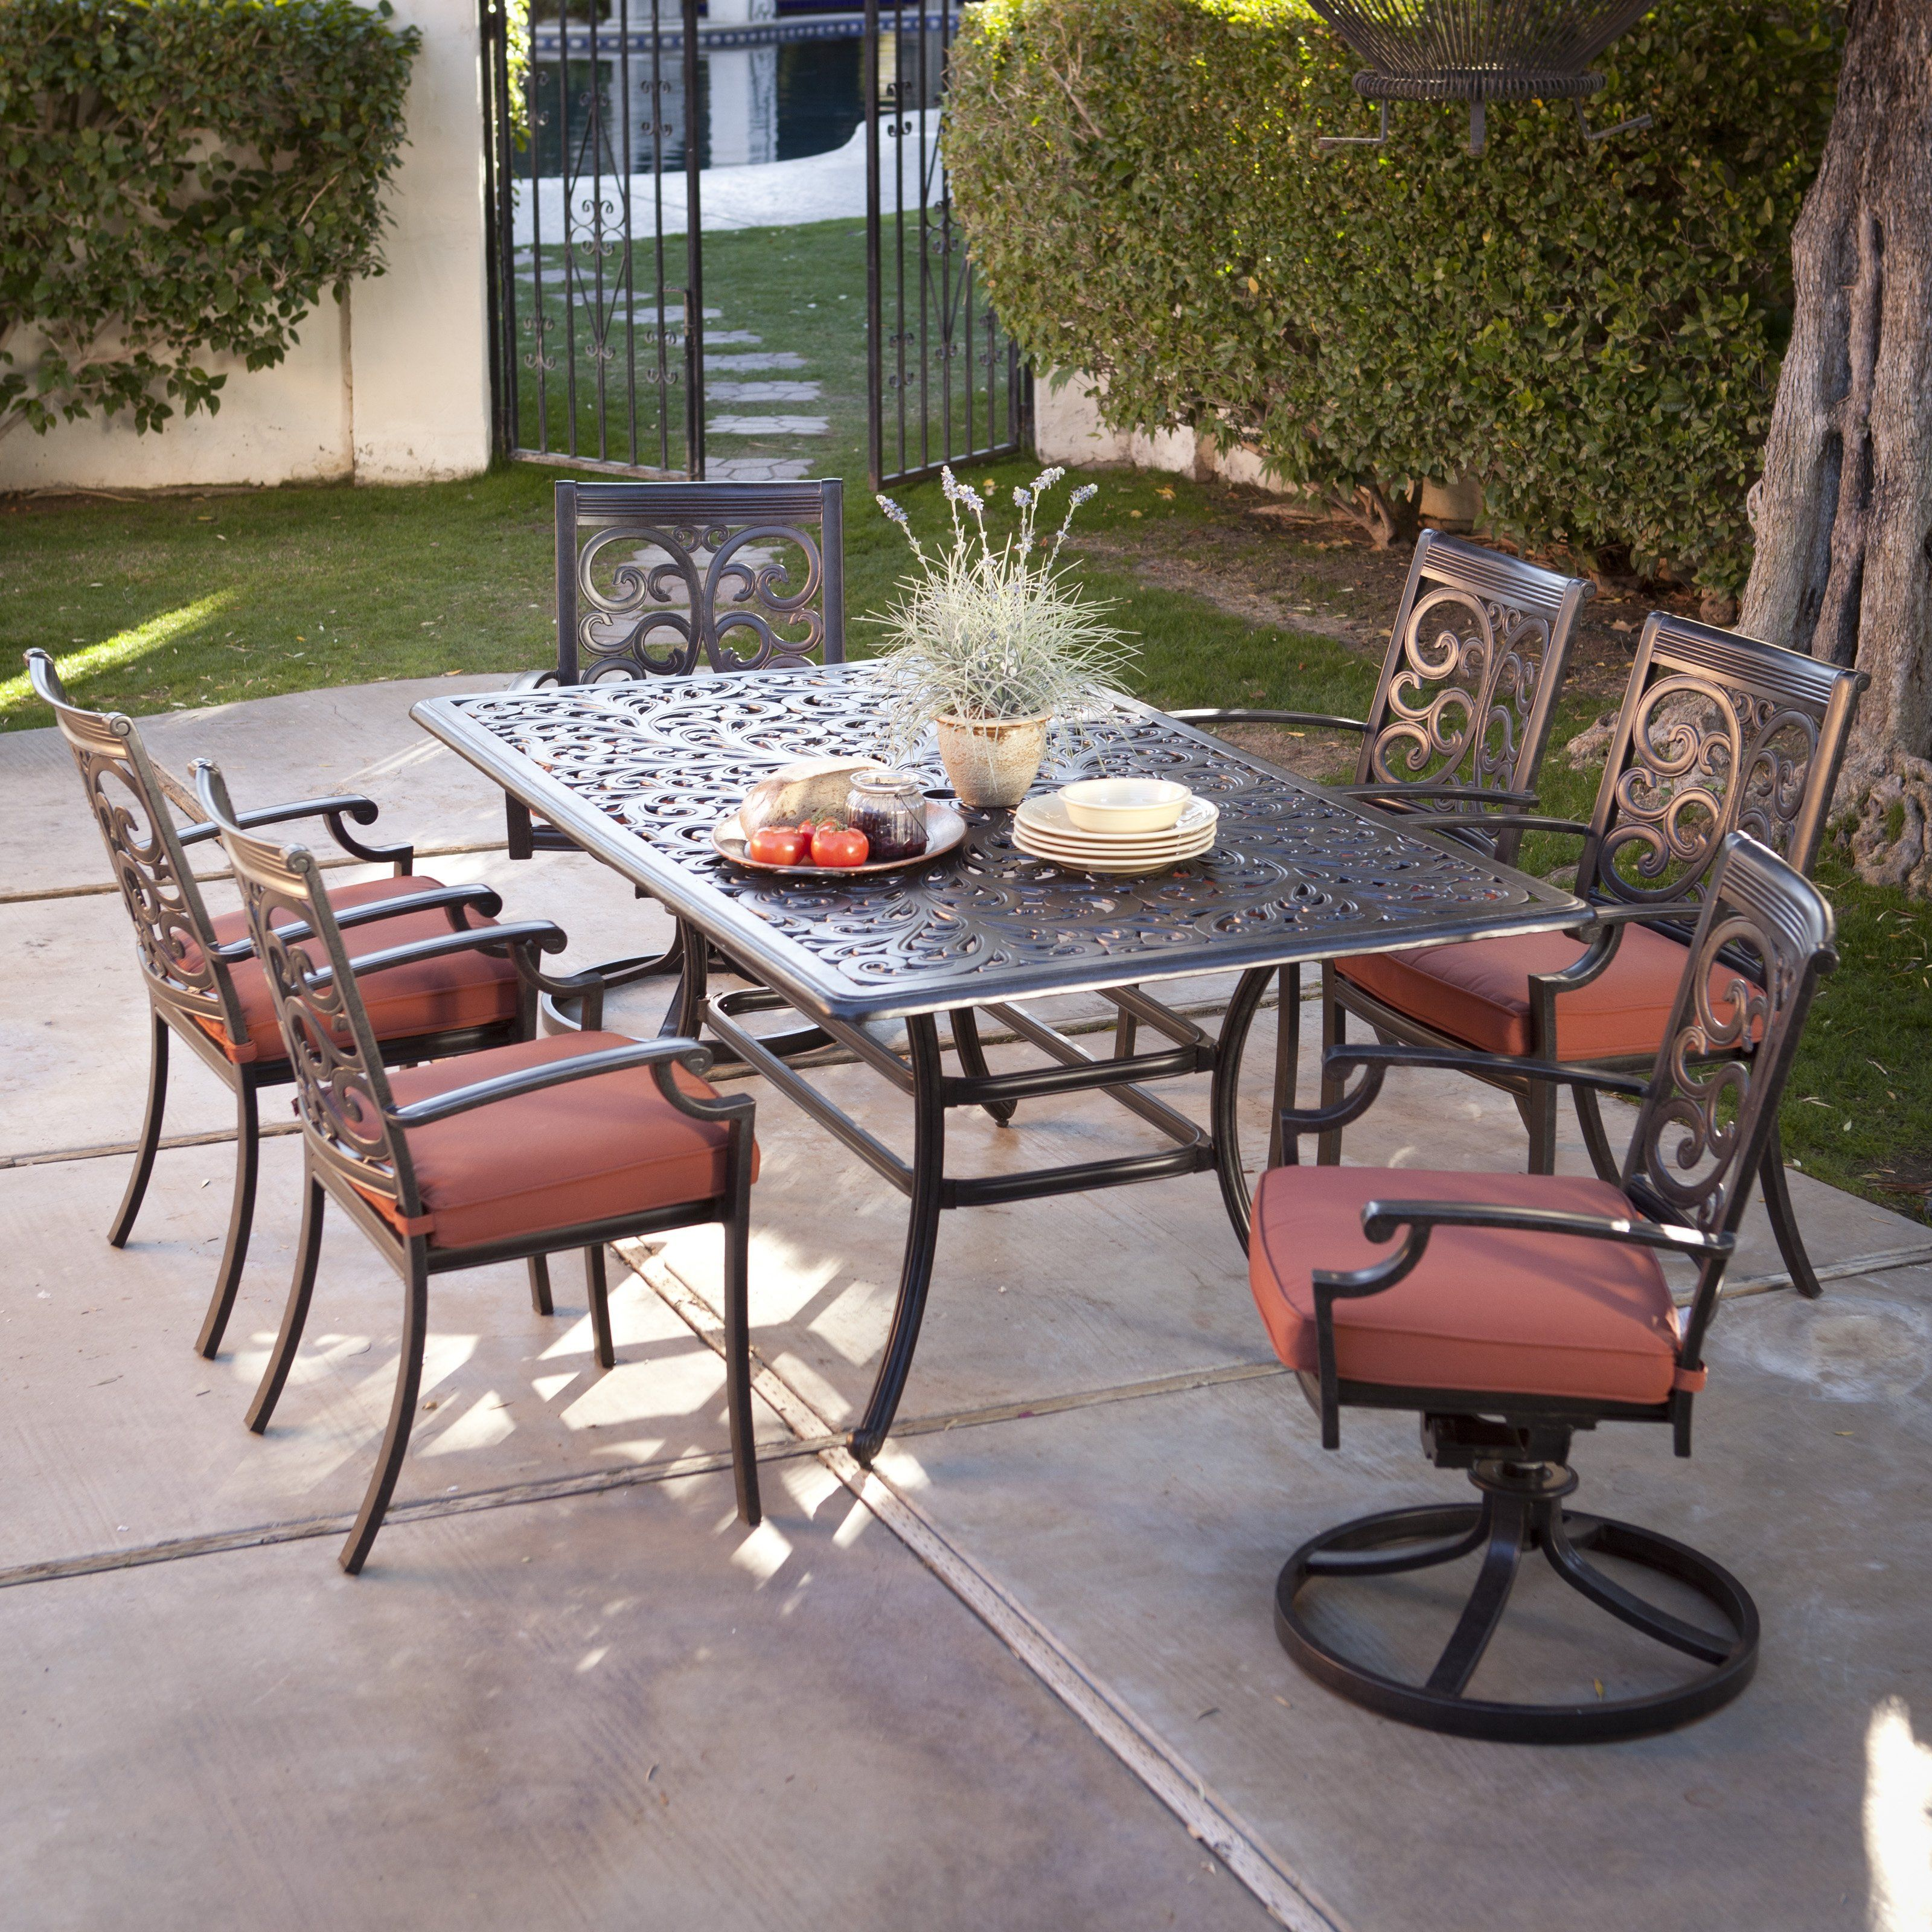 Palazetto San Miguel Cast Aluminum Patio Dining Set Seats 6